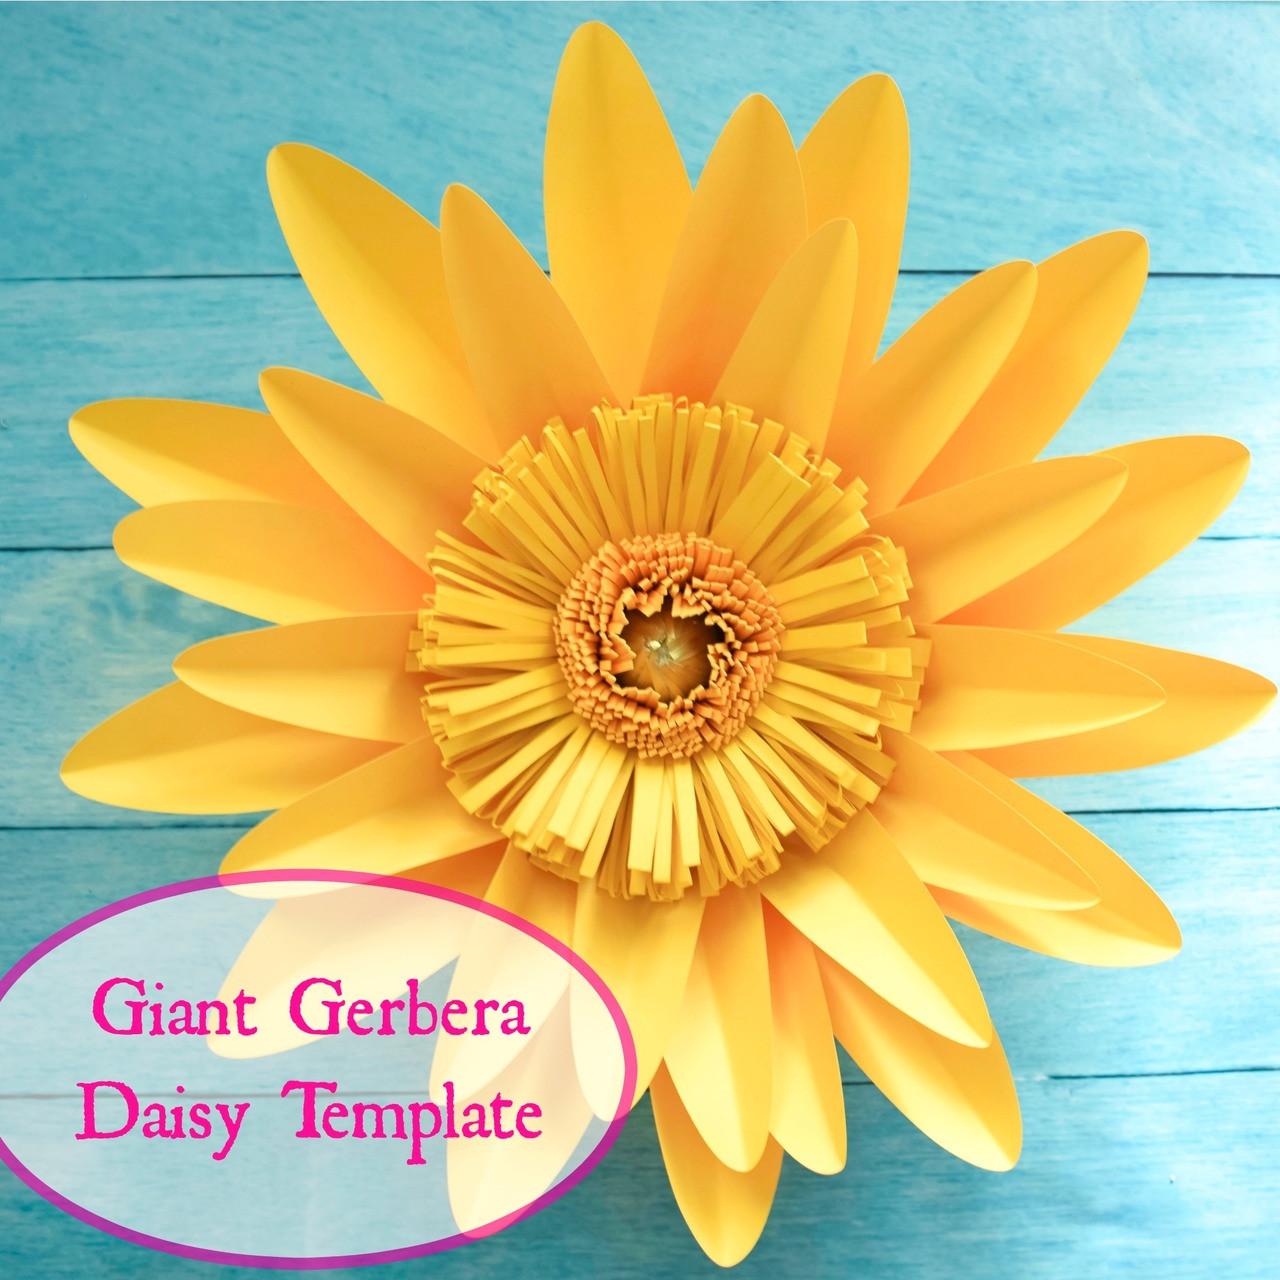 Giant Gerbera Daisy Paper Flower Template Catching Colorflies